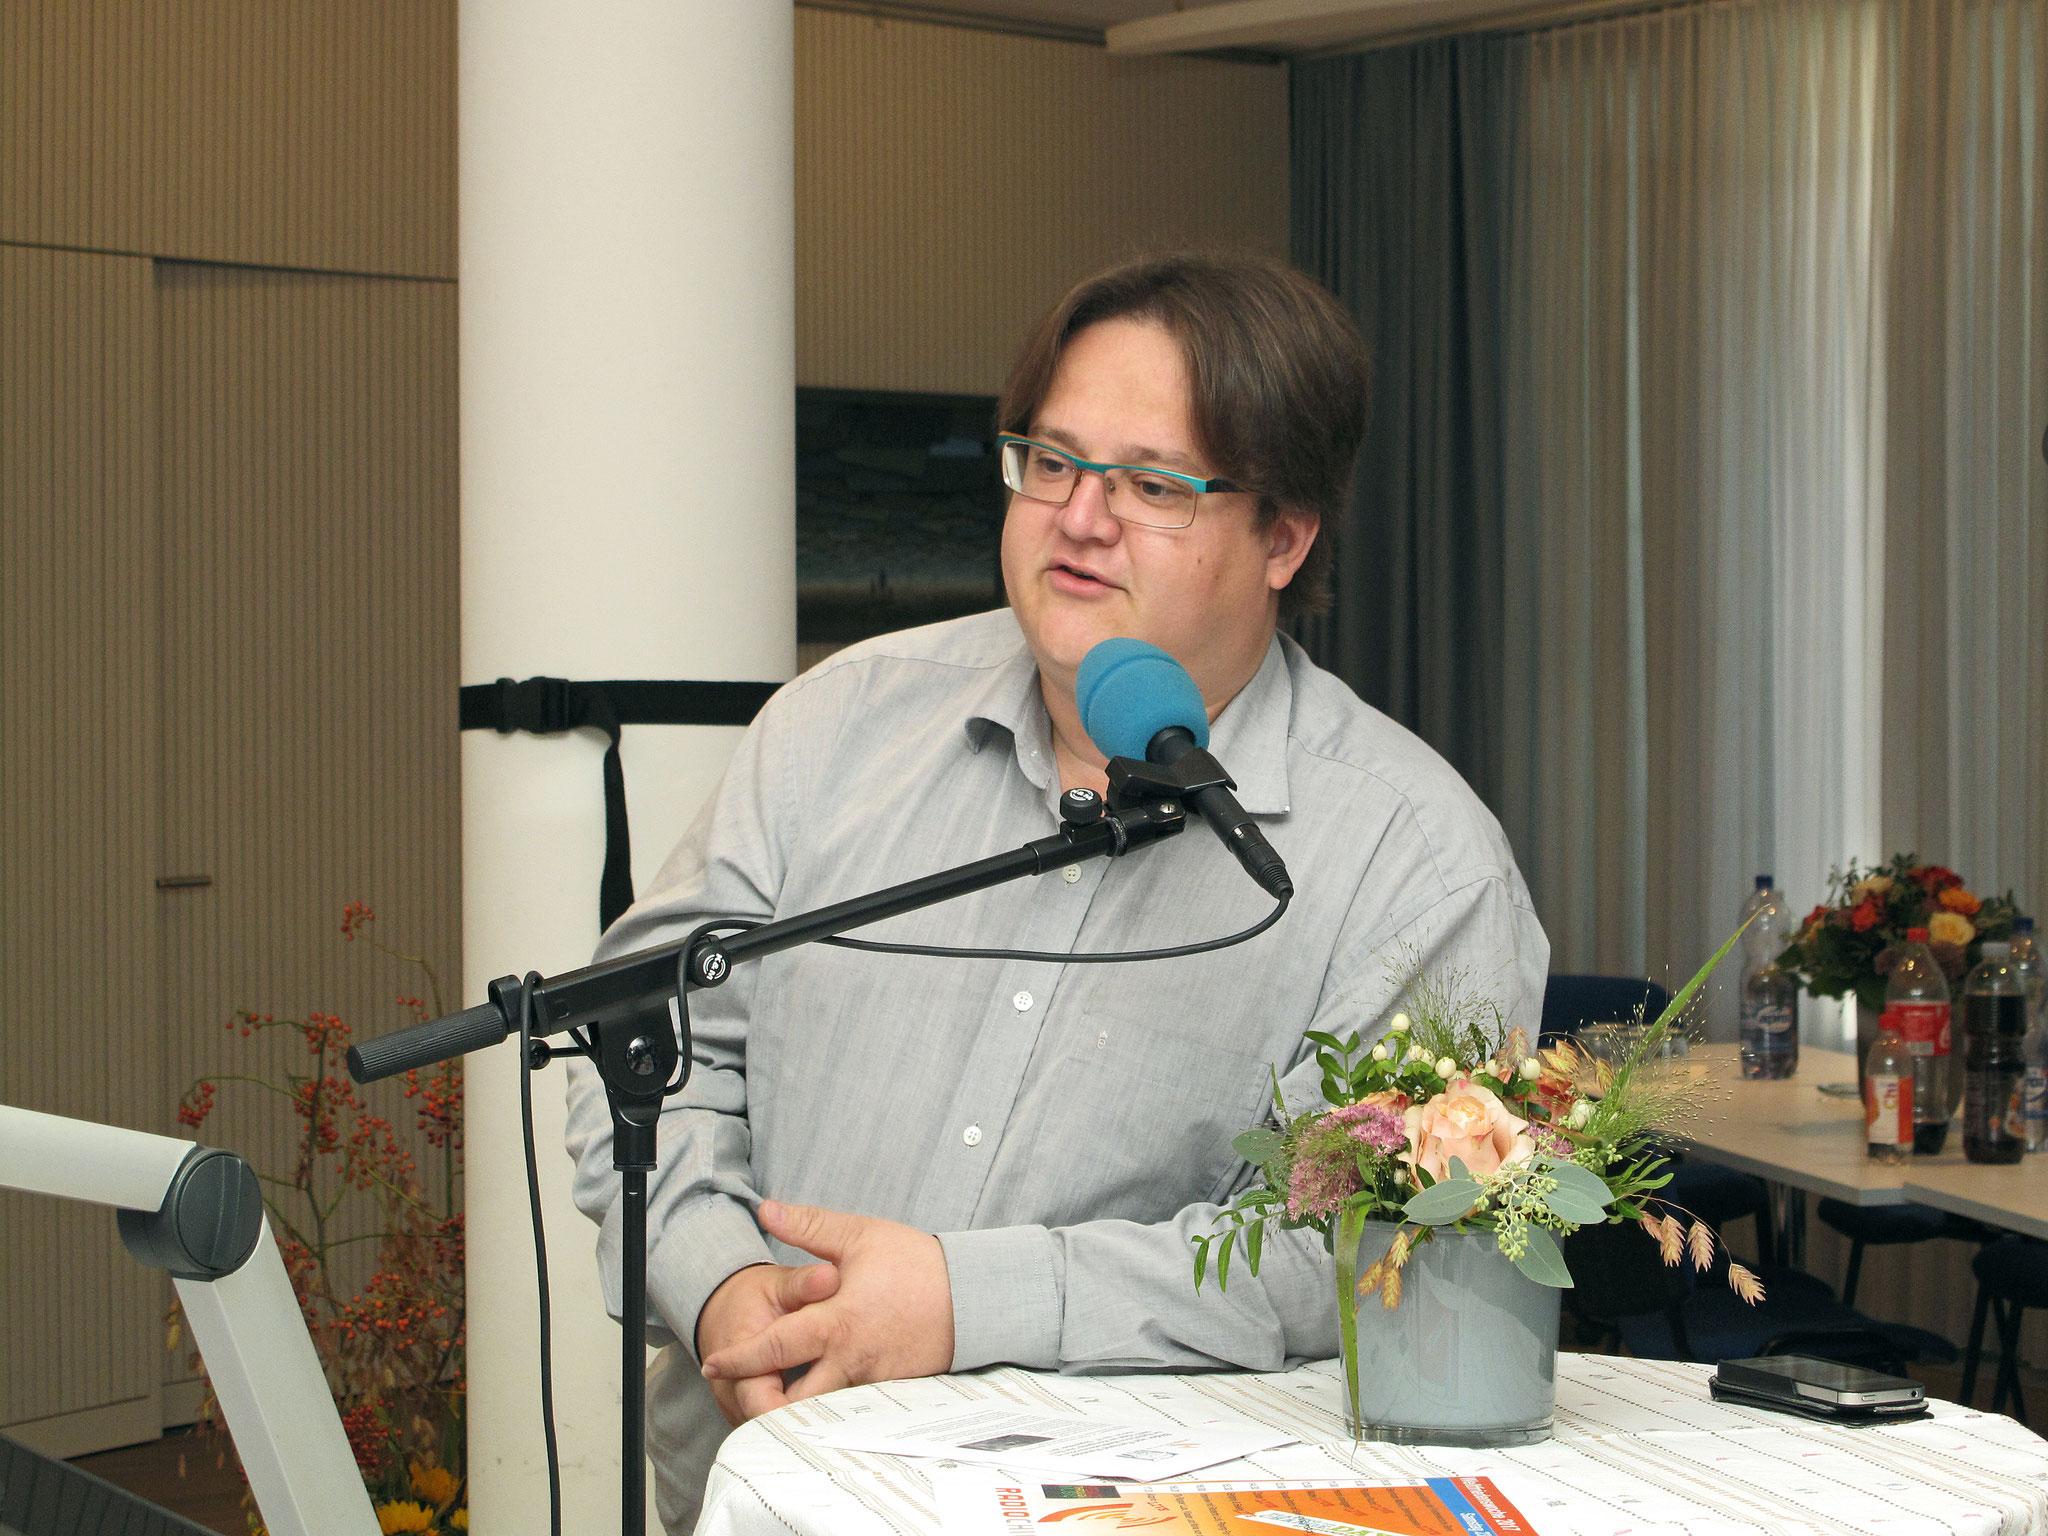 Renato Anneler, Loly